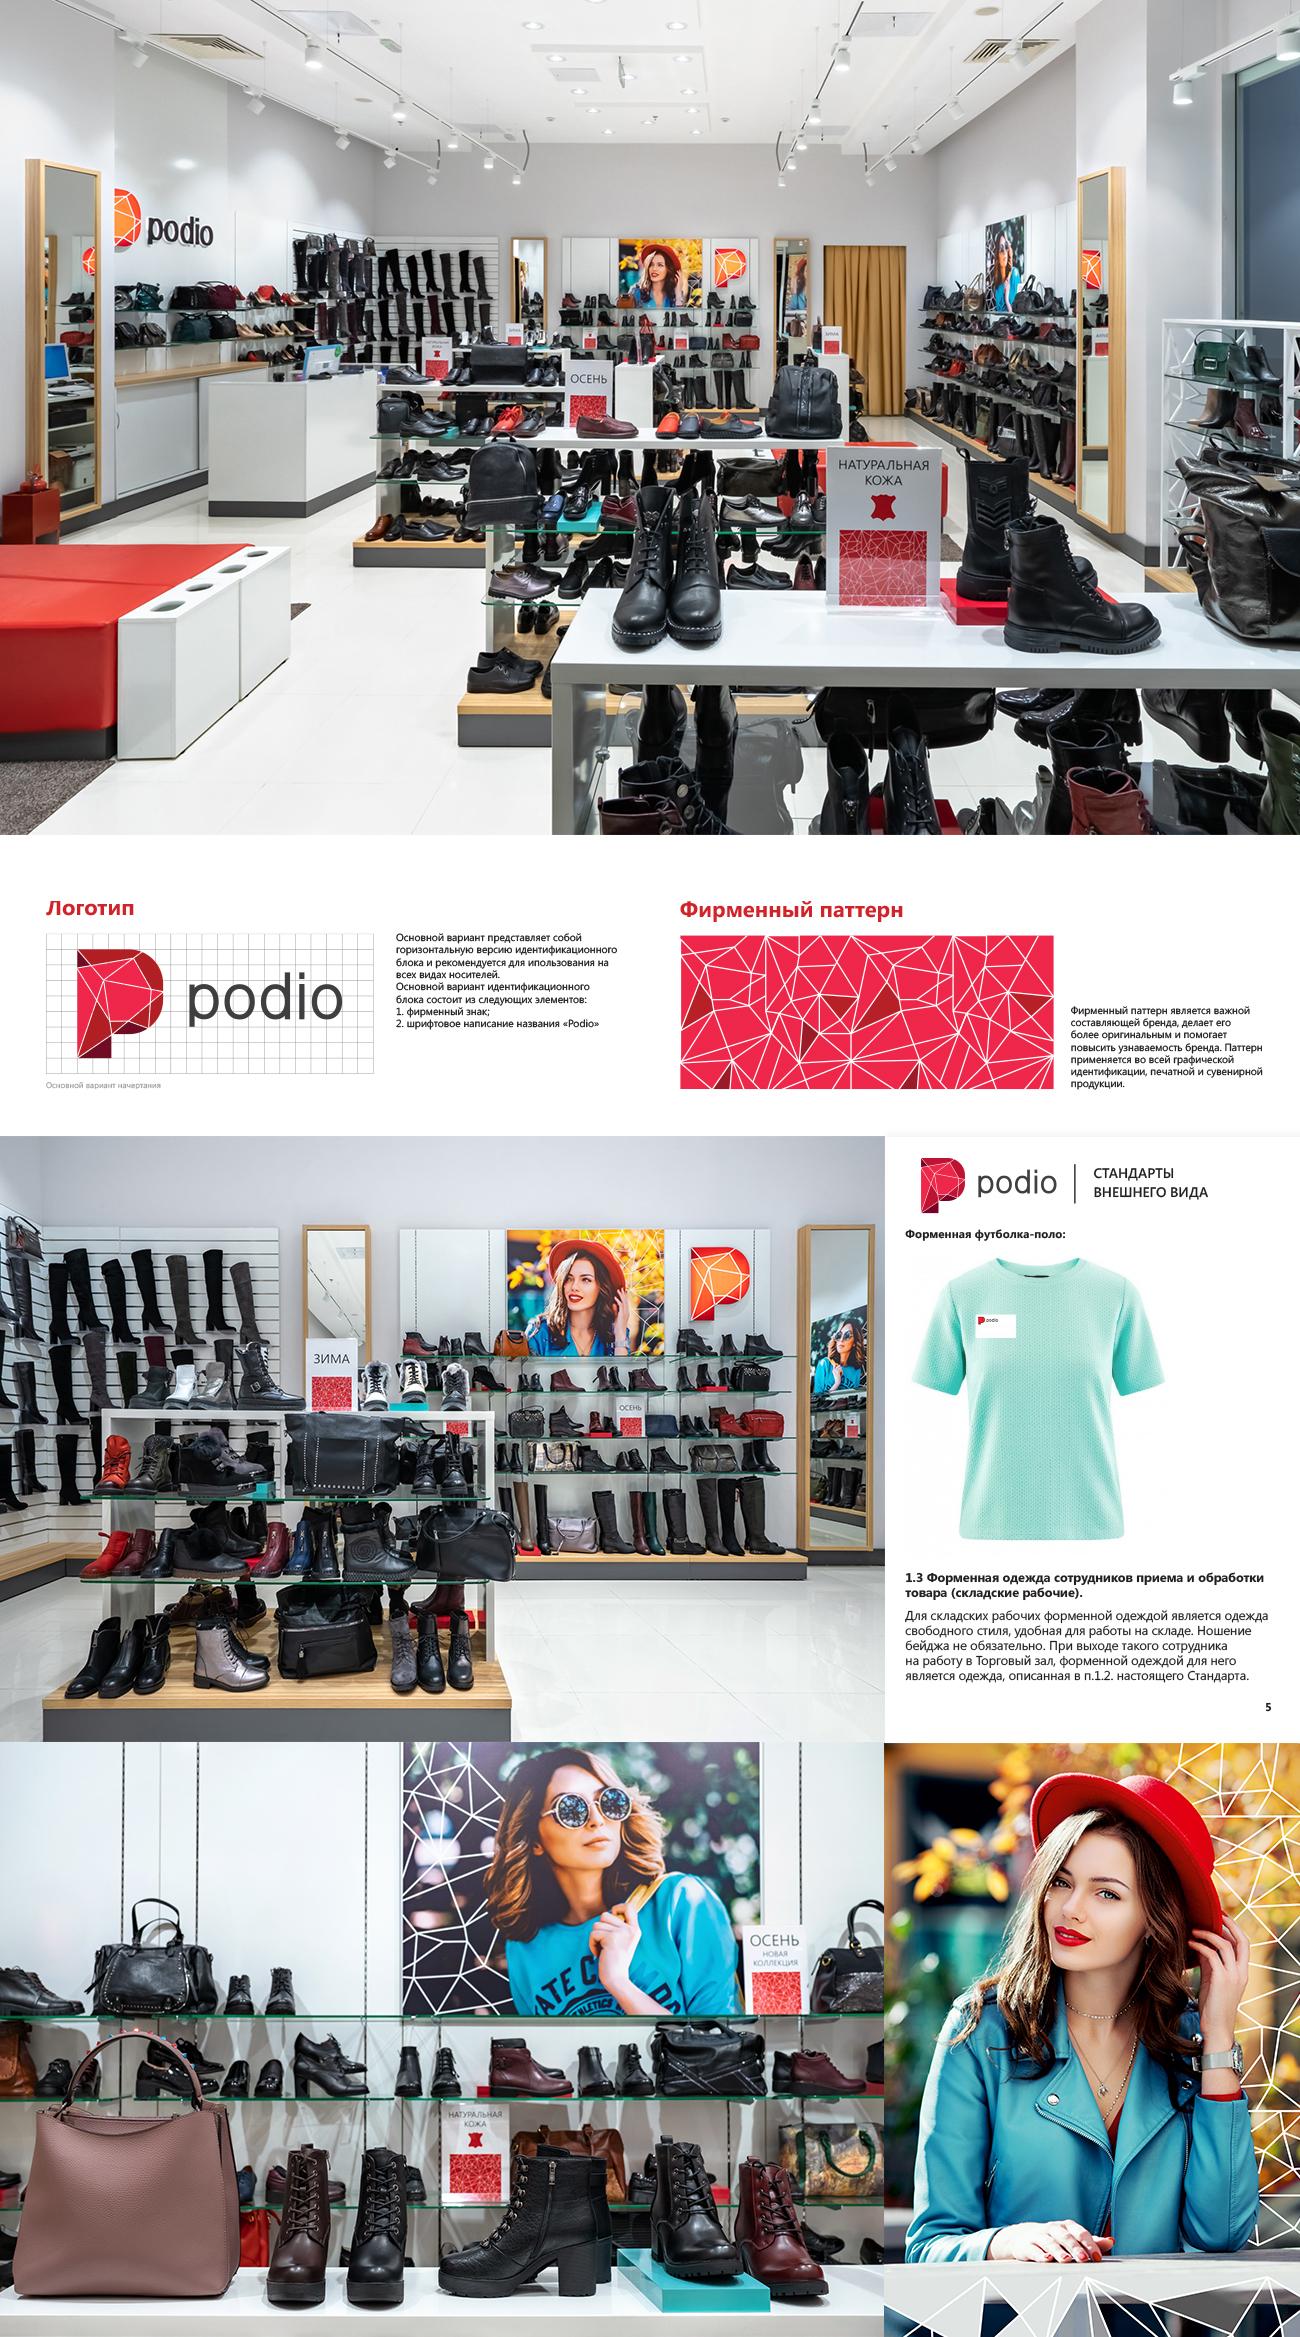 Podio. Разработка фирменного стиля